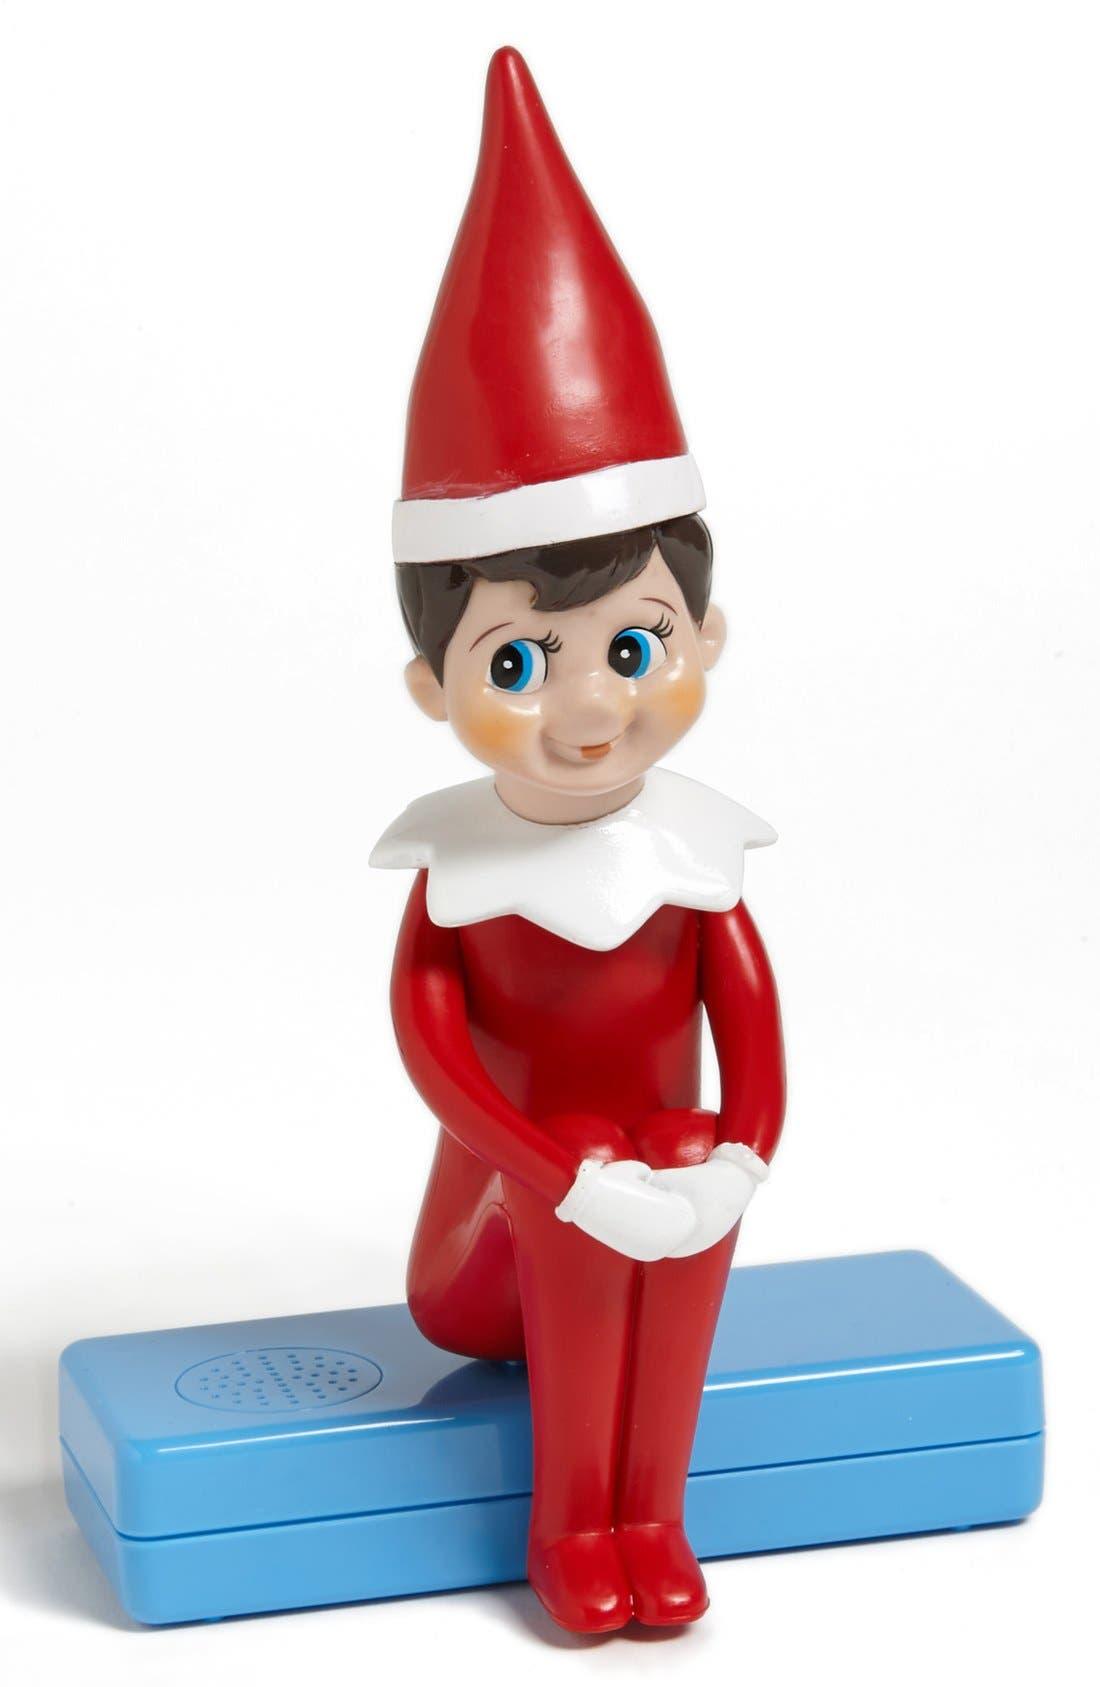 Alternate Image 1 Selected - Pressman Toy 'The Elf on the Shelf® - Musical Hide & Seek' Game